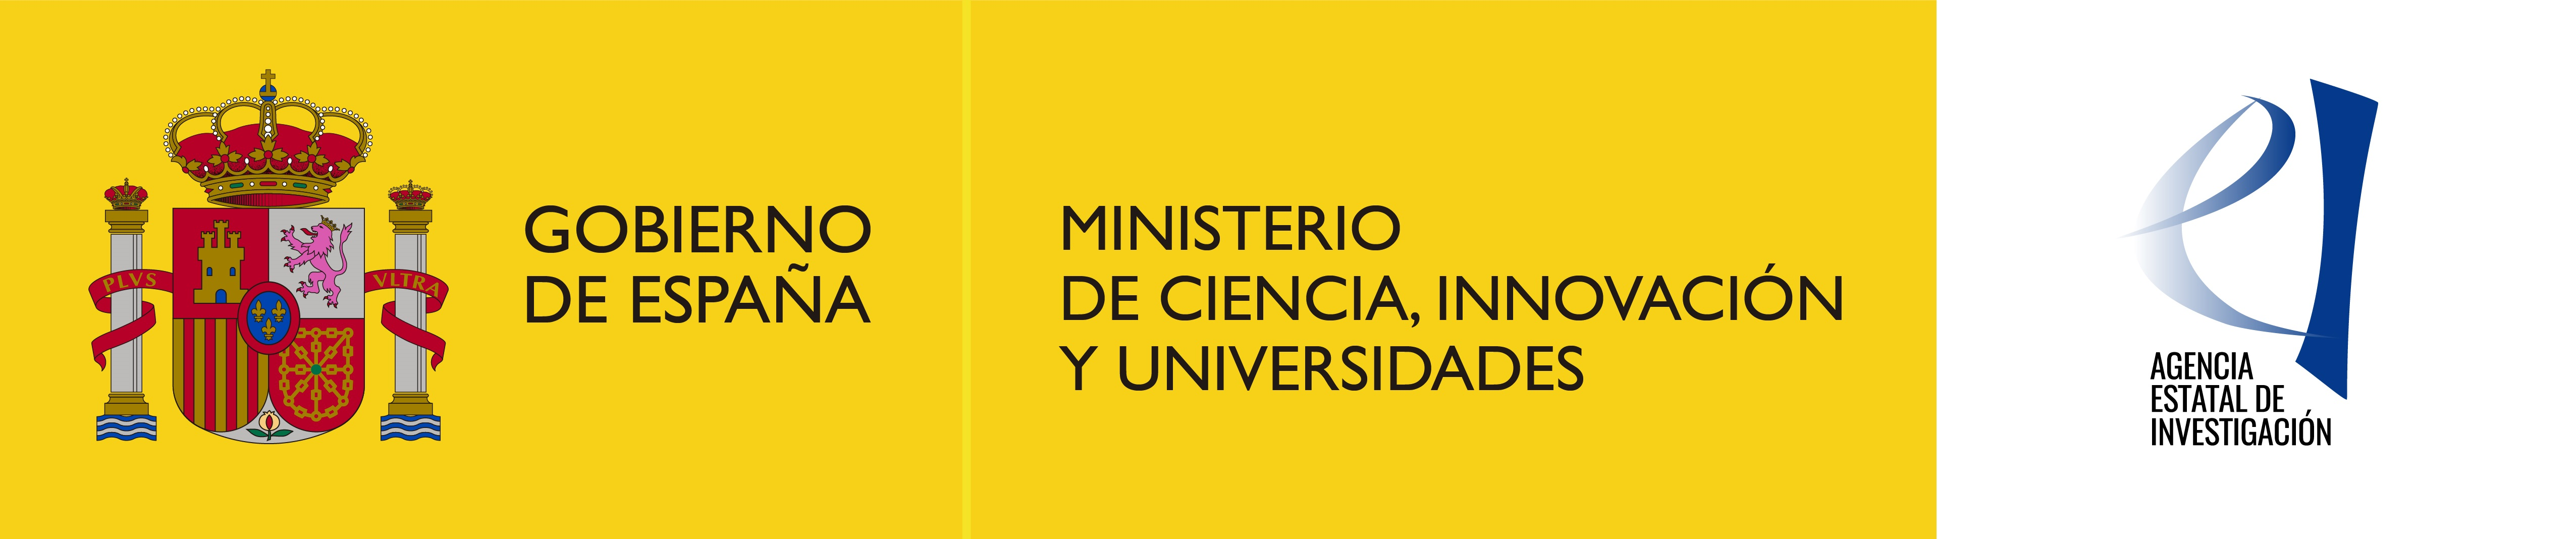 logo agencia estatal de investigación